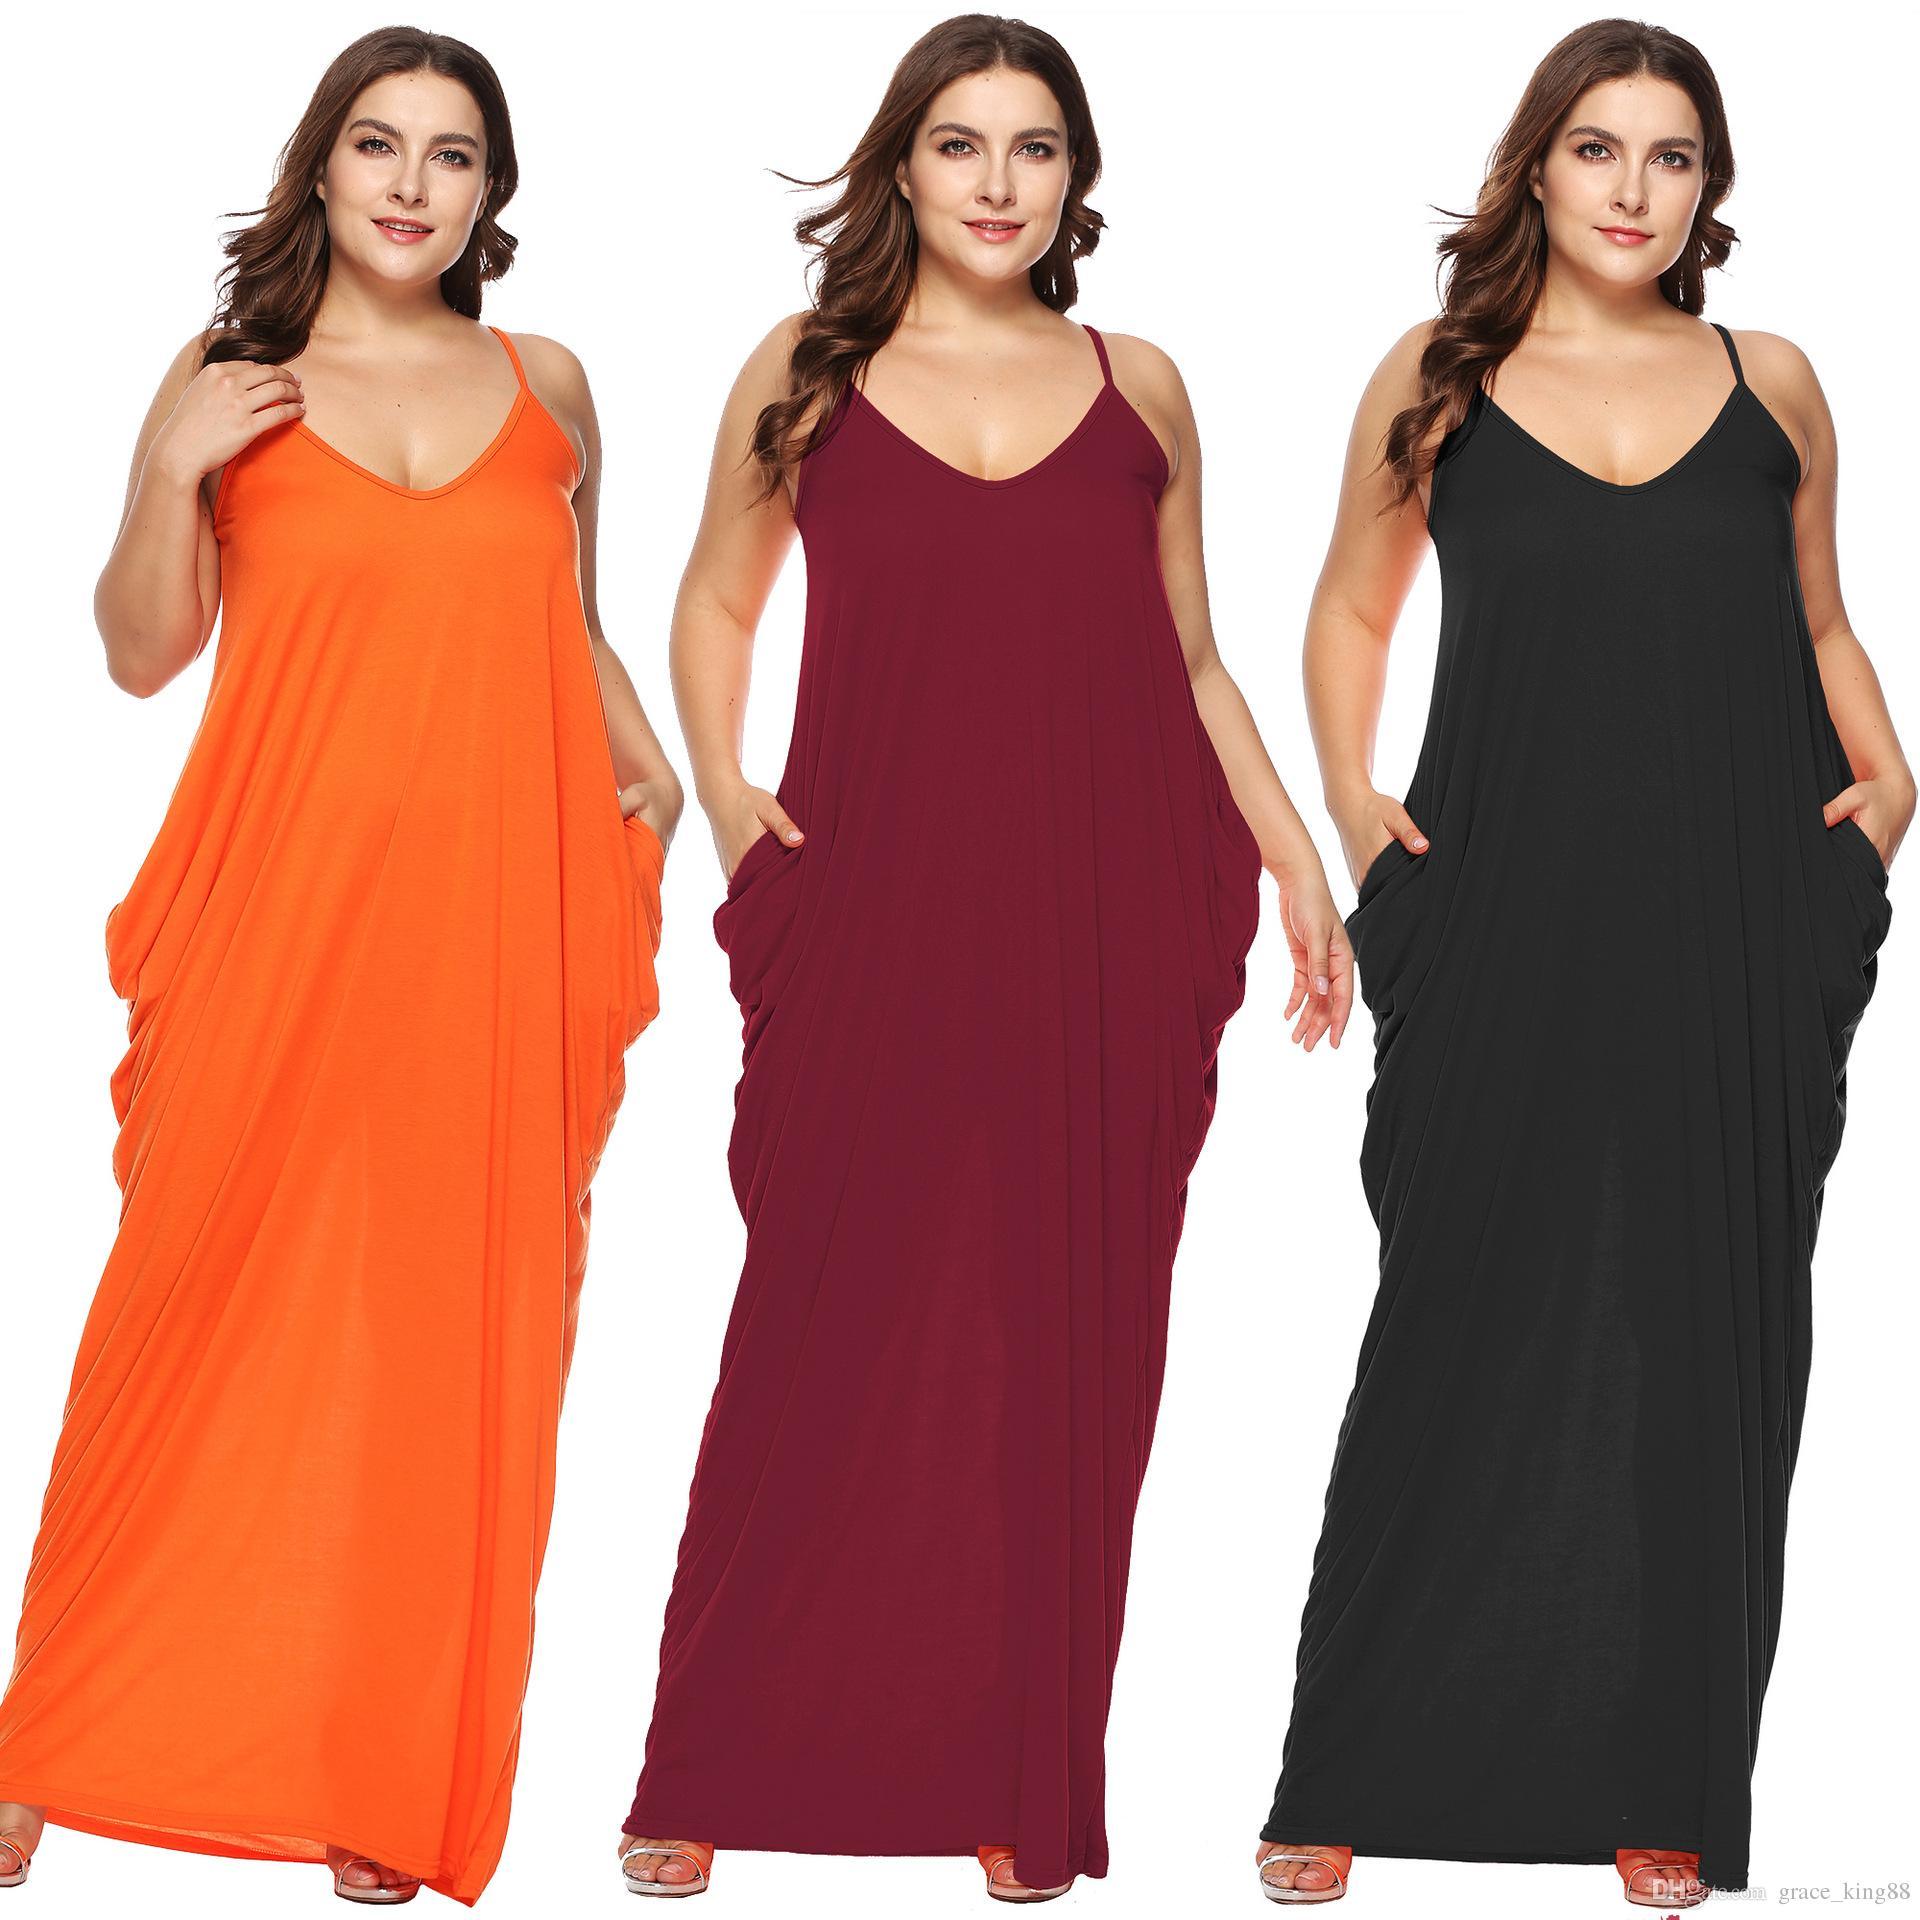 7ff1b019461e 2019New Women Casual Pocket Dress Sleeveless Comfortable Loose Plus Size  Clothes Asymmetrical Beach Maxi Dress XL 2XL 3XL Casual Pocket Dress Maxi  Dress ...